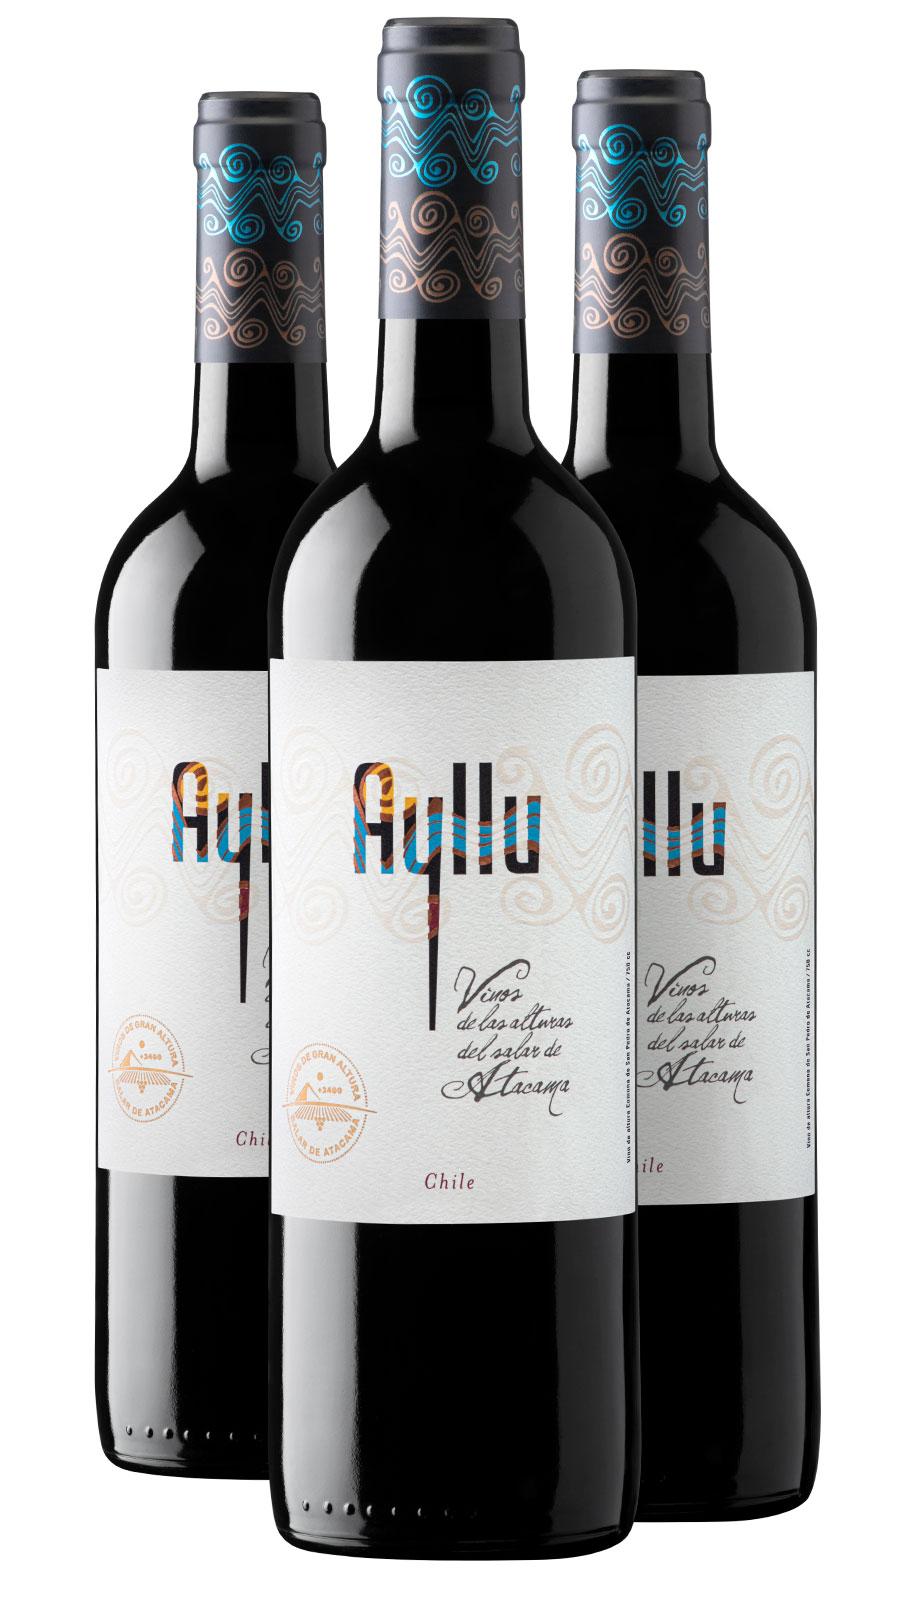 Ayllu Red wines 2019 (5 bottle box)